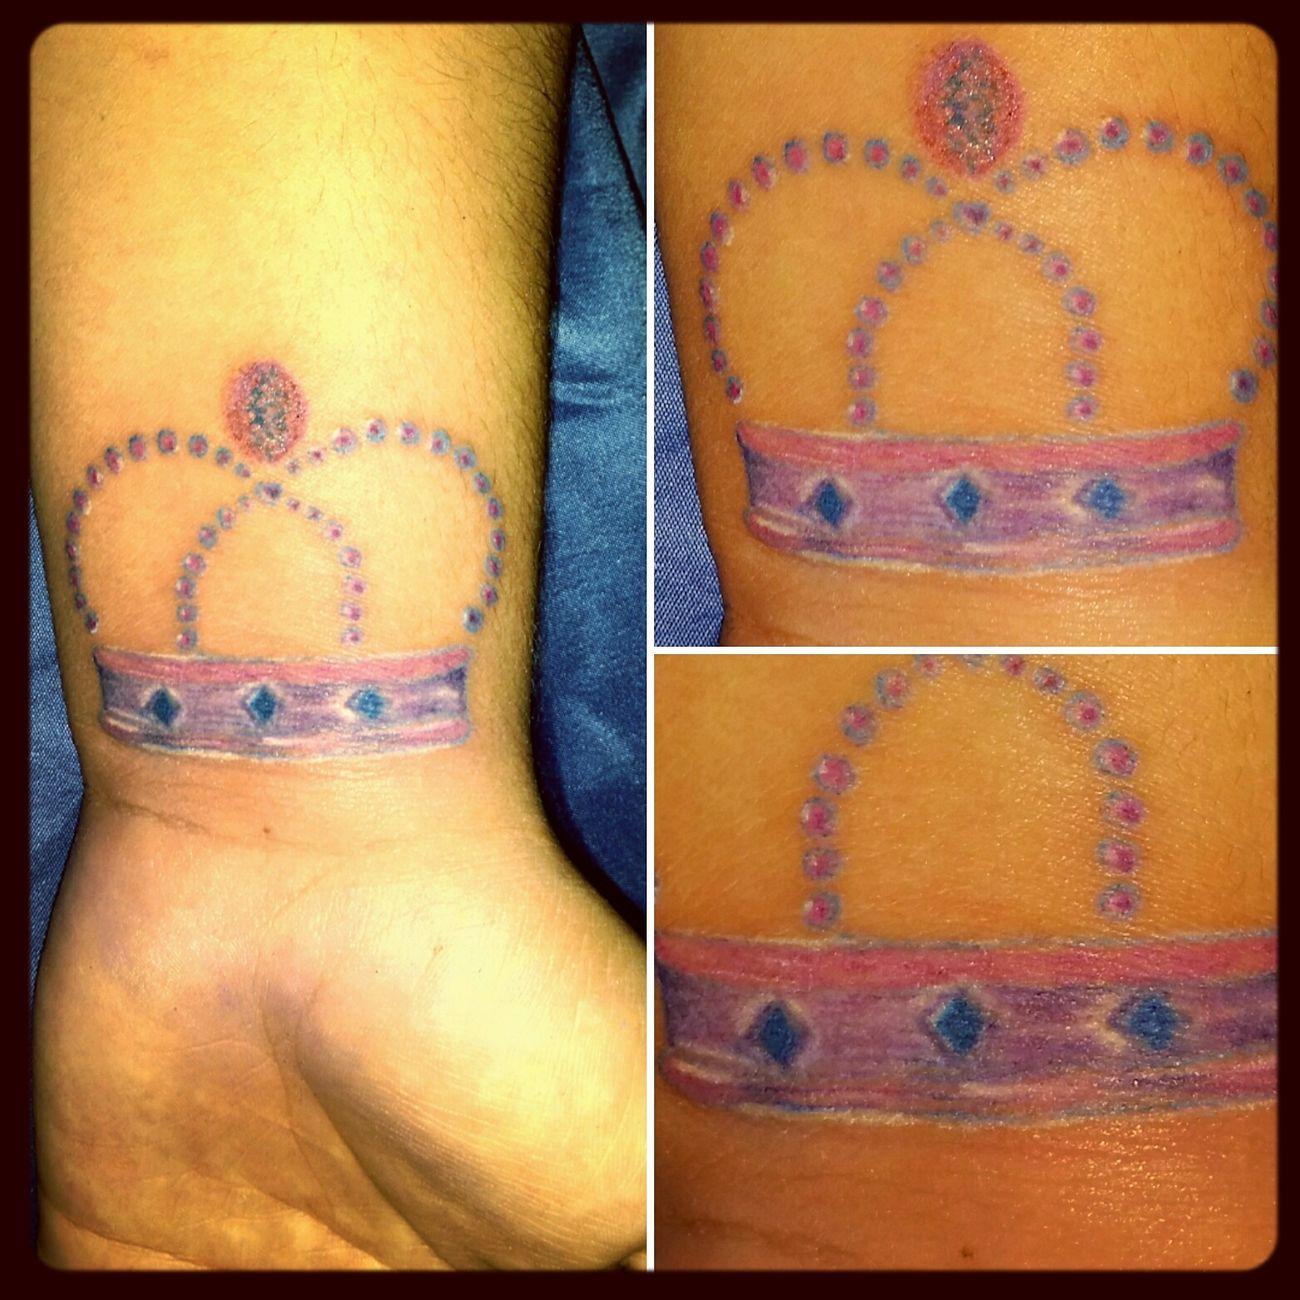 Tattooedgirls Chilena Selfie✌ Tattoogirl Tatuaje Tatoo Art Tattoo Tattooed Tattoo ❤ Tatto ✌ Tattoos Tattoo Life Tattooart Tattooman Tattooartist  Tattooartist  Samsung Smart Camera Smartphonephotography Smartshots Todostatuados